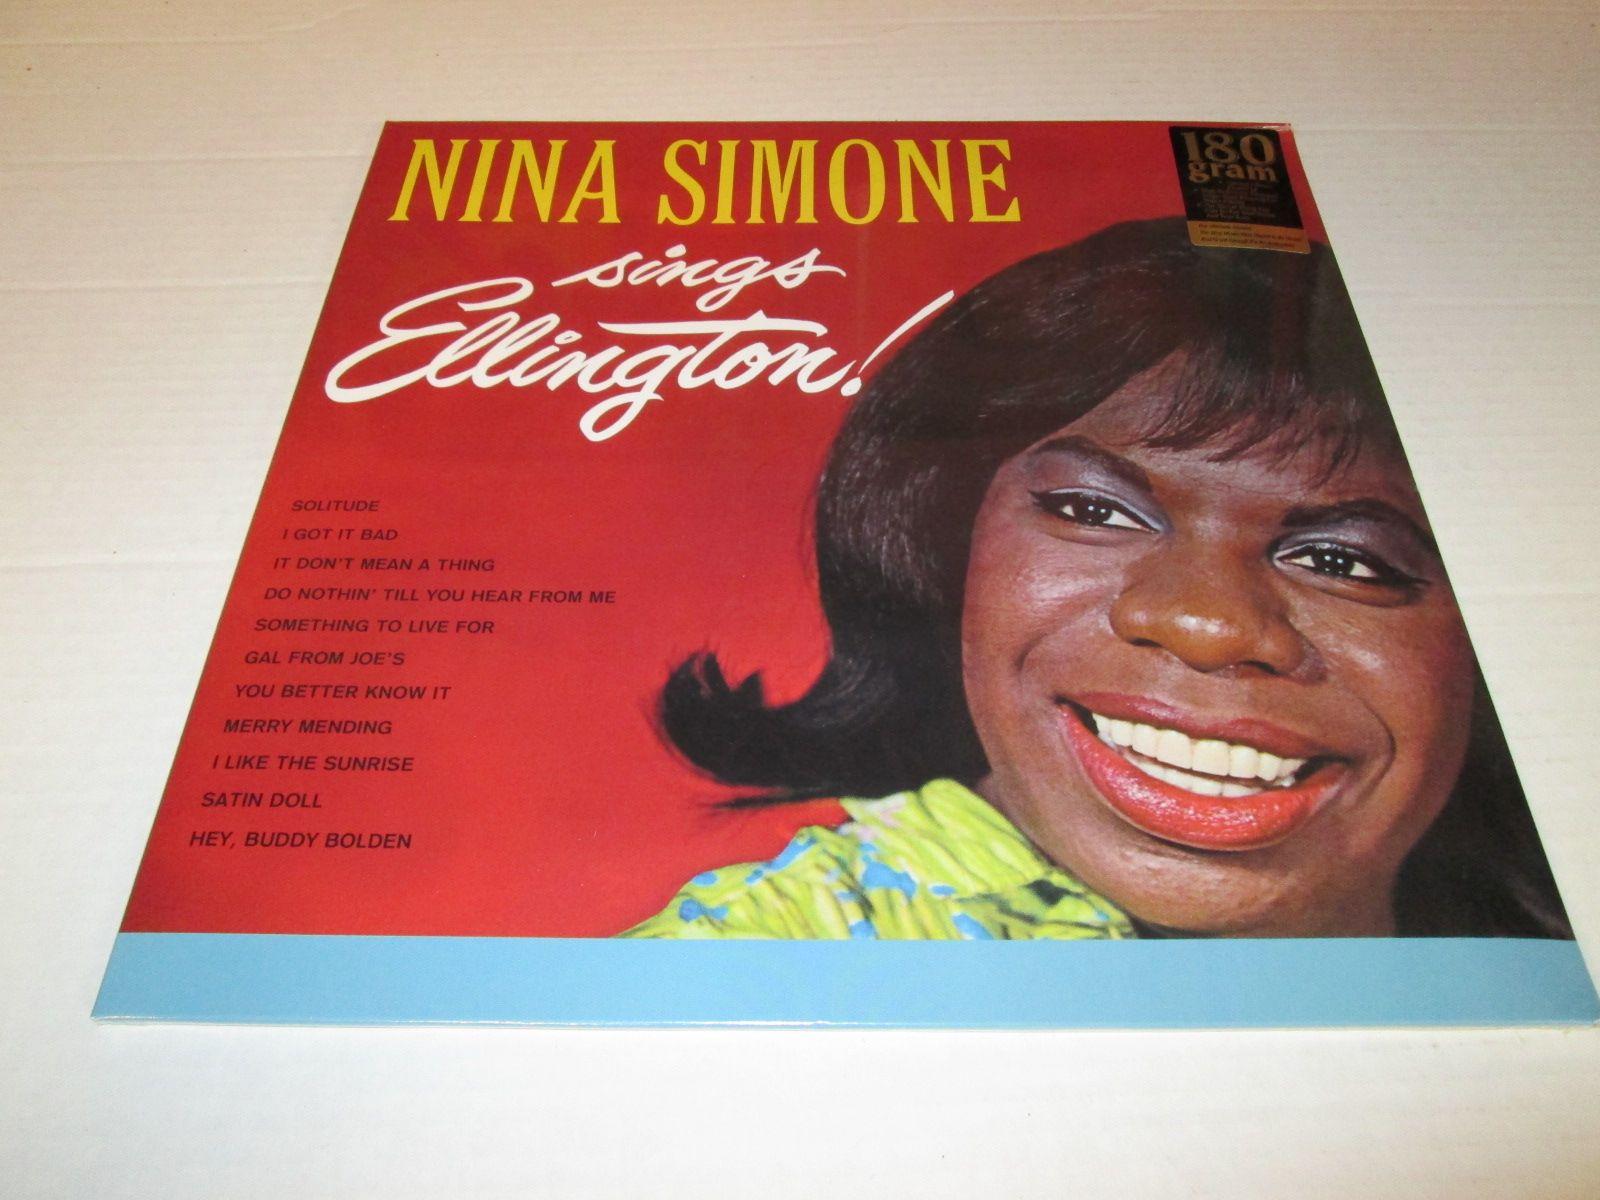 Nina Simone sings Duke Ellington. #vvmo #vinyl #bingem